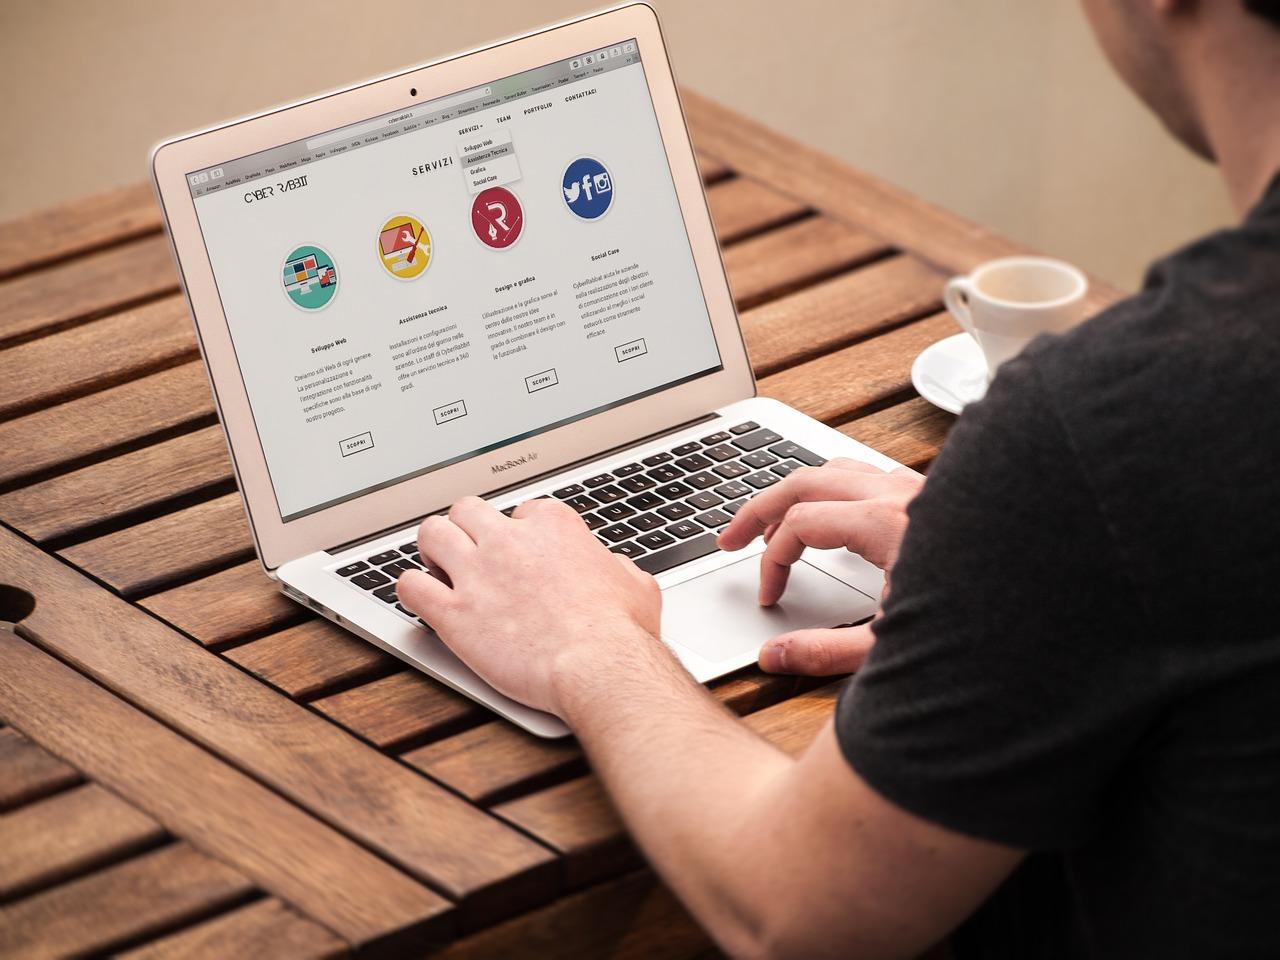 A man visiting a website on a laptop